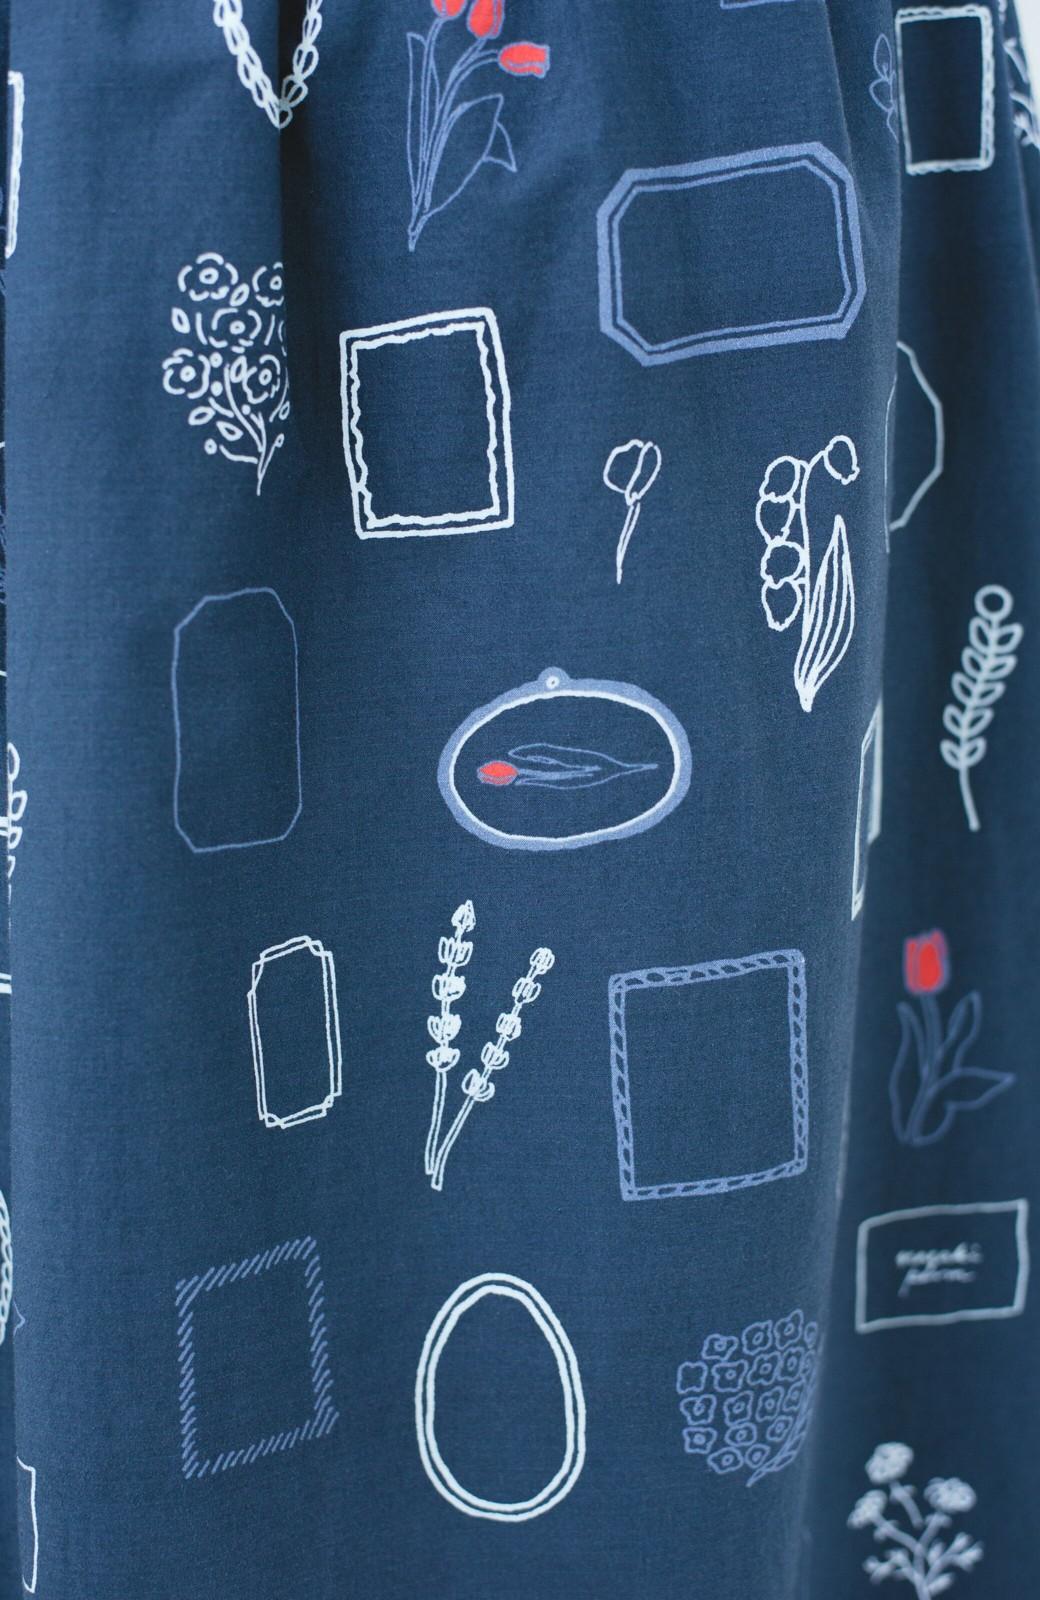 haco! PBP minne作家 ナガキパーマさんと作ったオーガニックコットンの綿麻総柄プリントスカート by haco!×minne one+more project  <ネイビー>の商品写真3